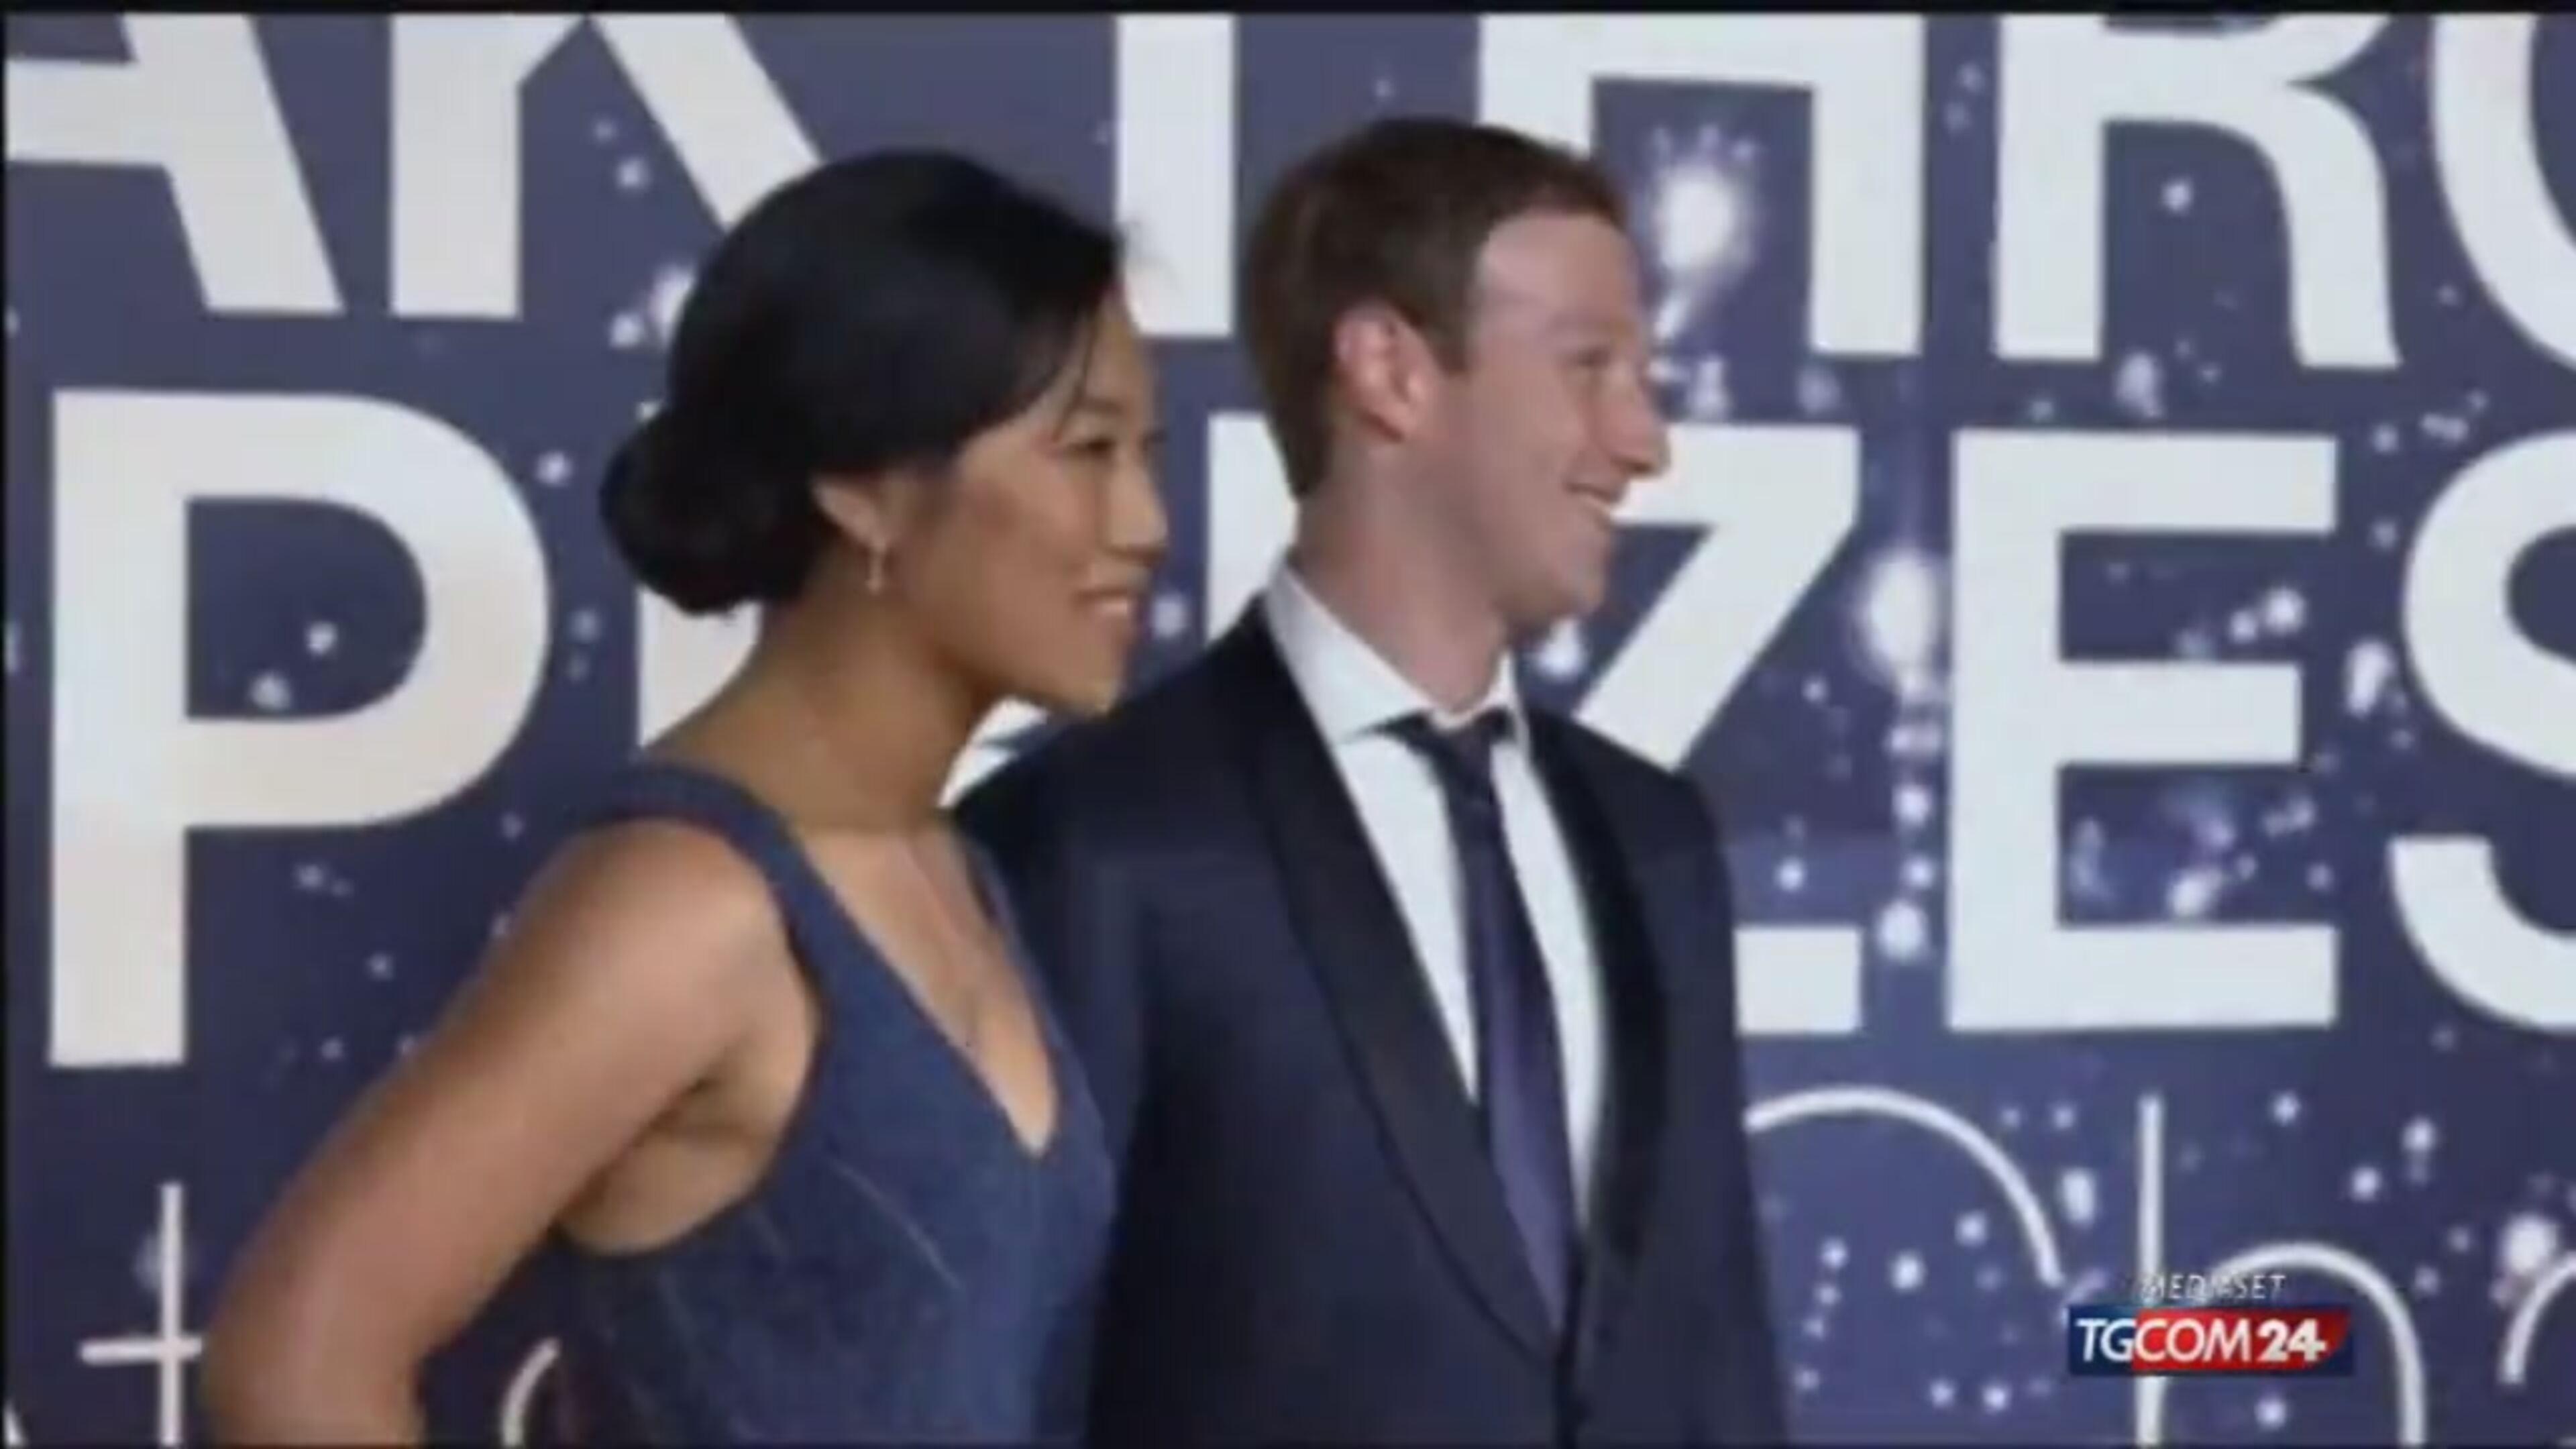 Zuckerberg papà generoso